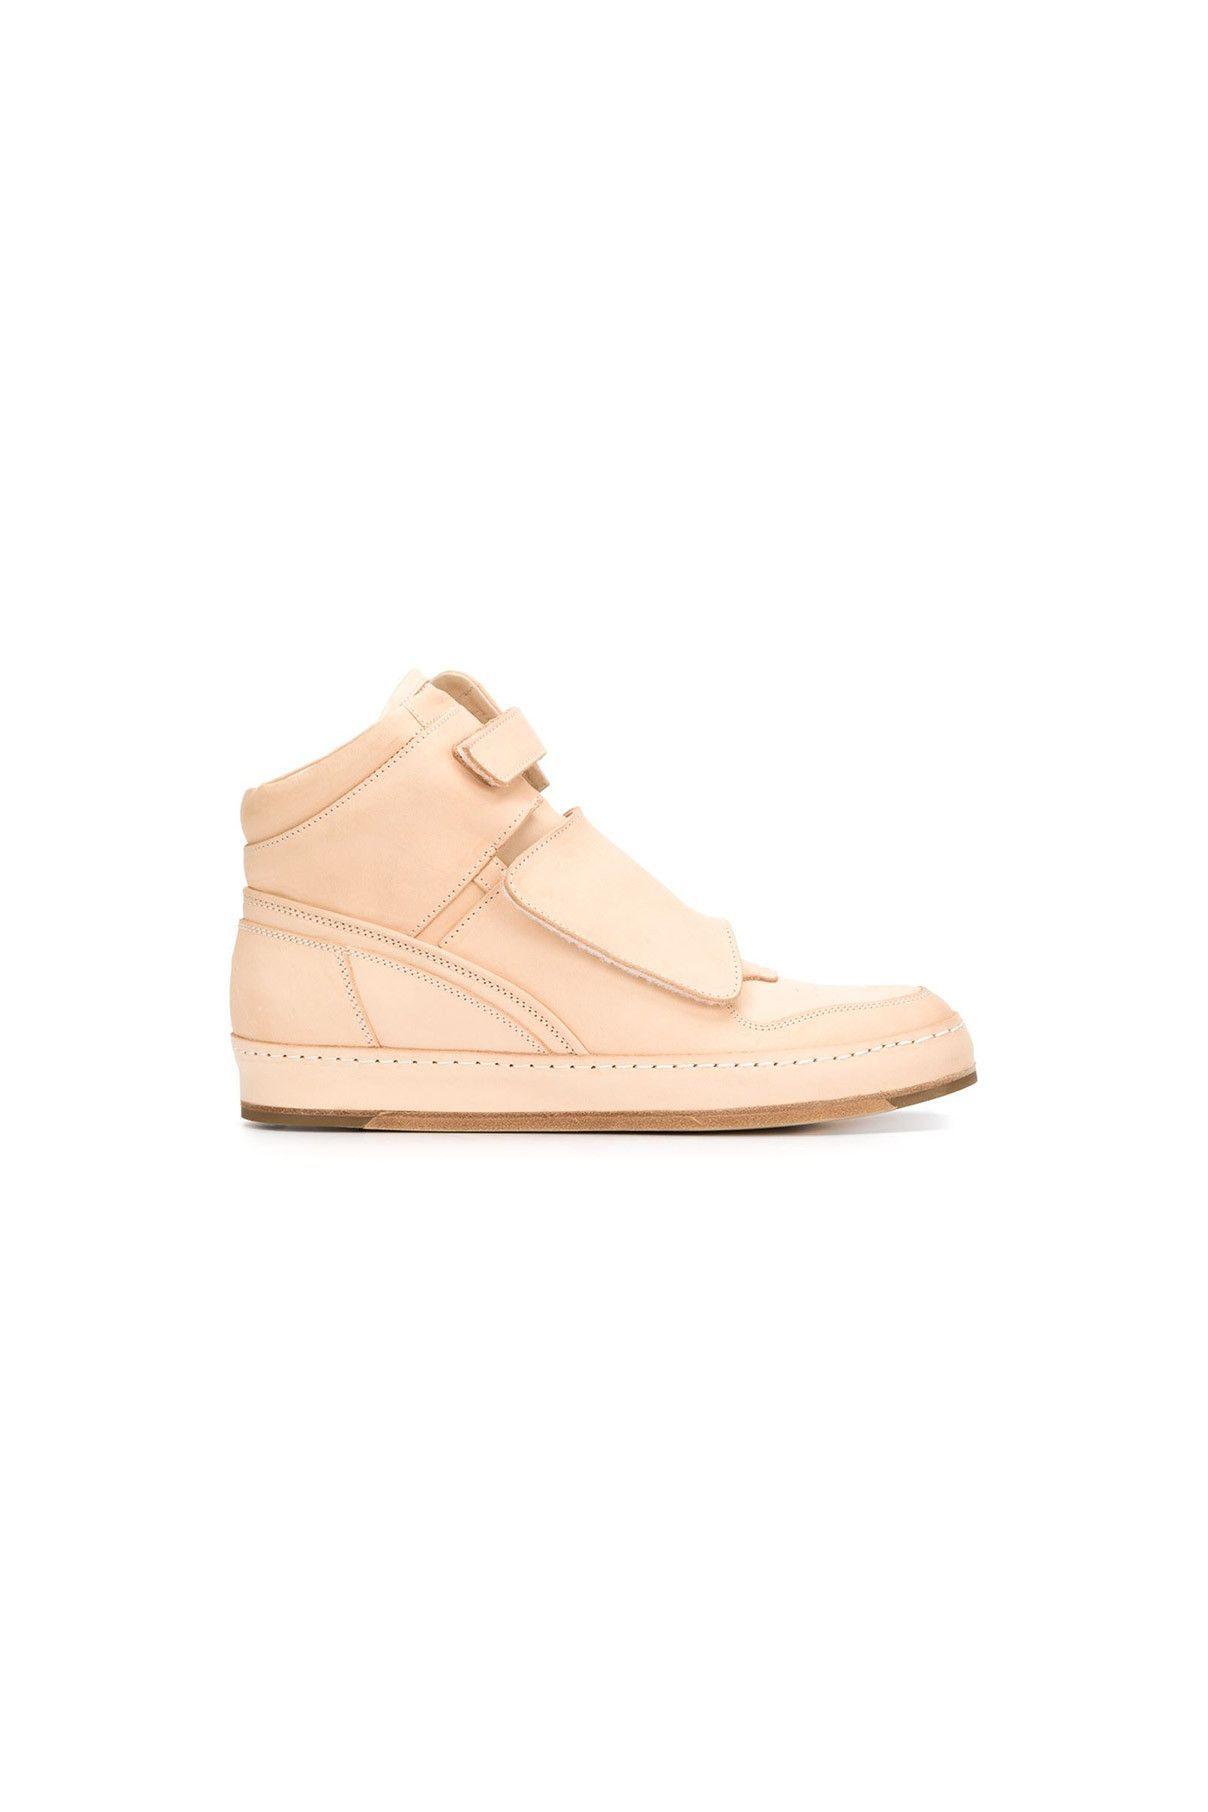 {Hender Scheme / 02 shoe / 06 sneaker} Manual Industrial Products 06